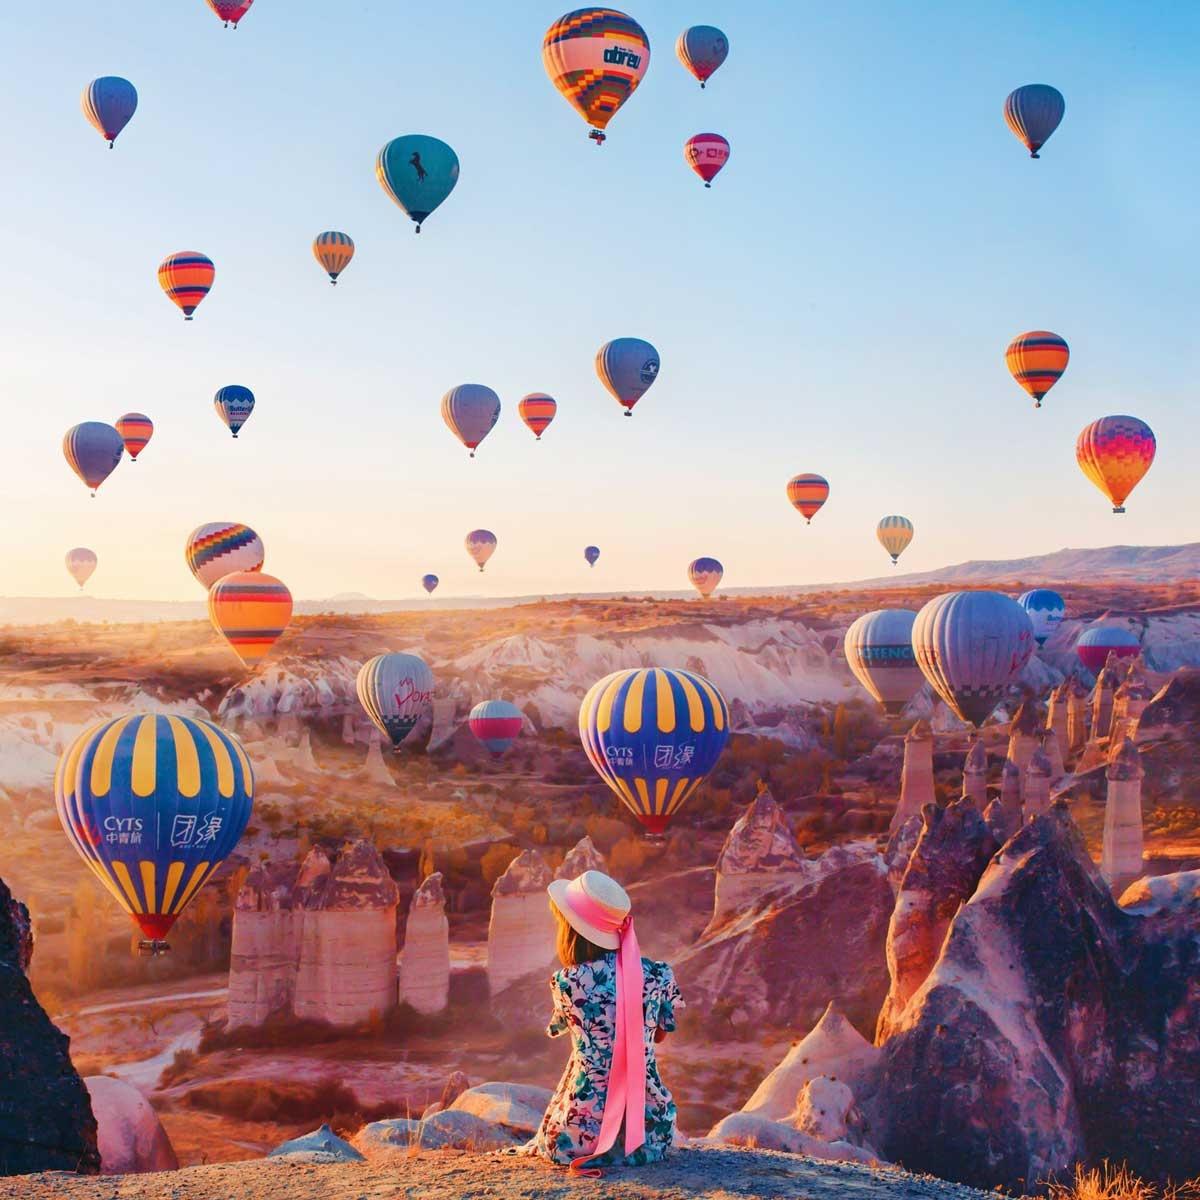 Den Cappadocia ngam khi cau khong lo tren bau troi cao nguyen hinh anh 4